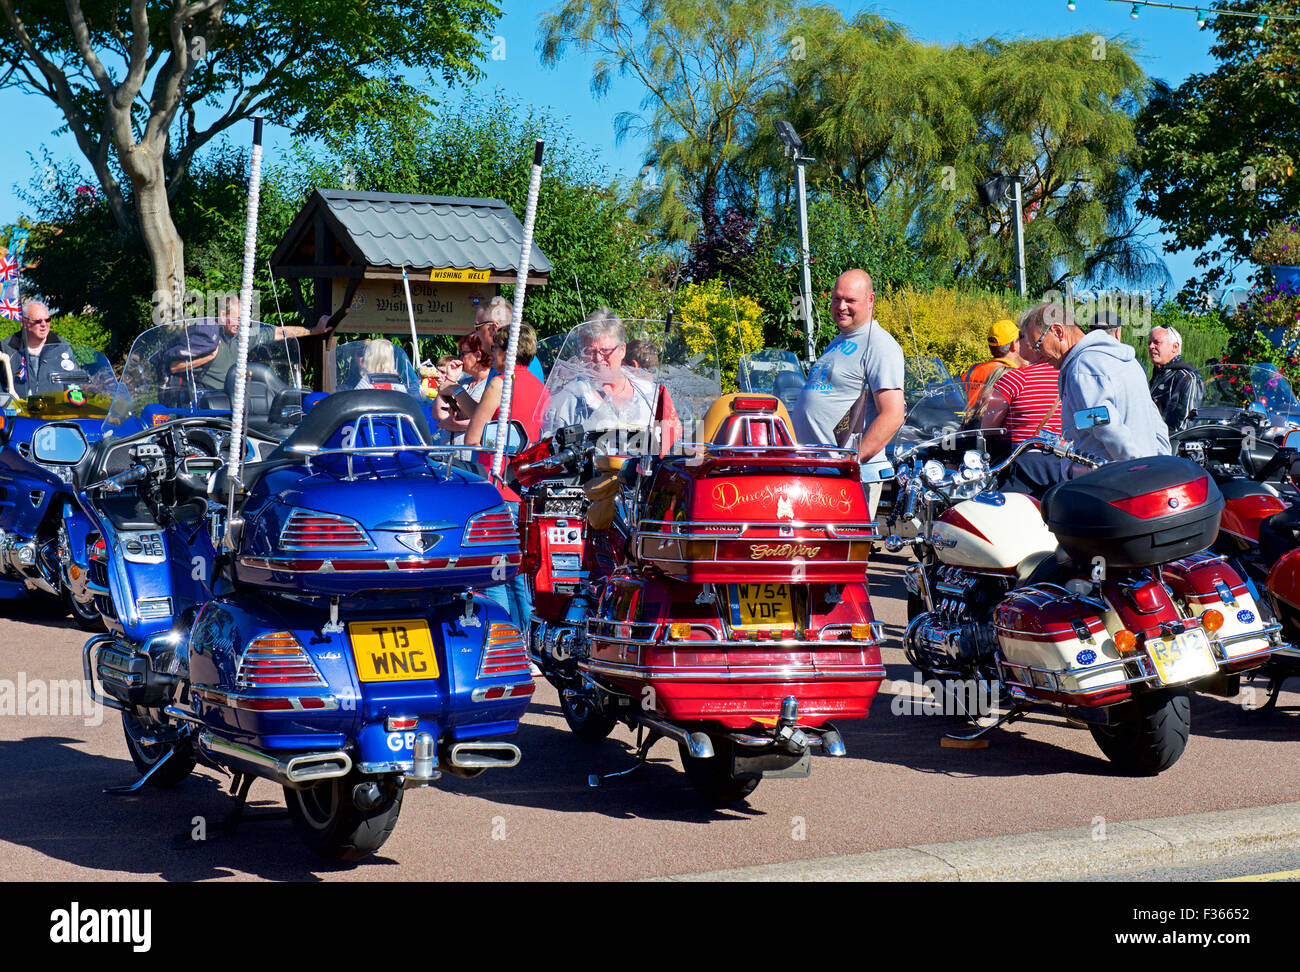 Display of Honda Goldwing motorbikes - and mascots - at Skegness, Lincolnshire, England UK - Stock Image